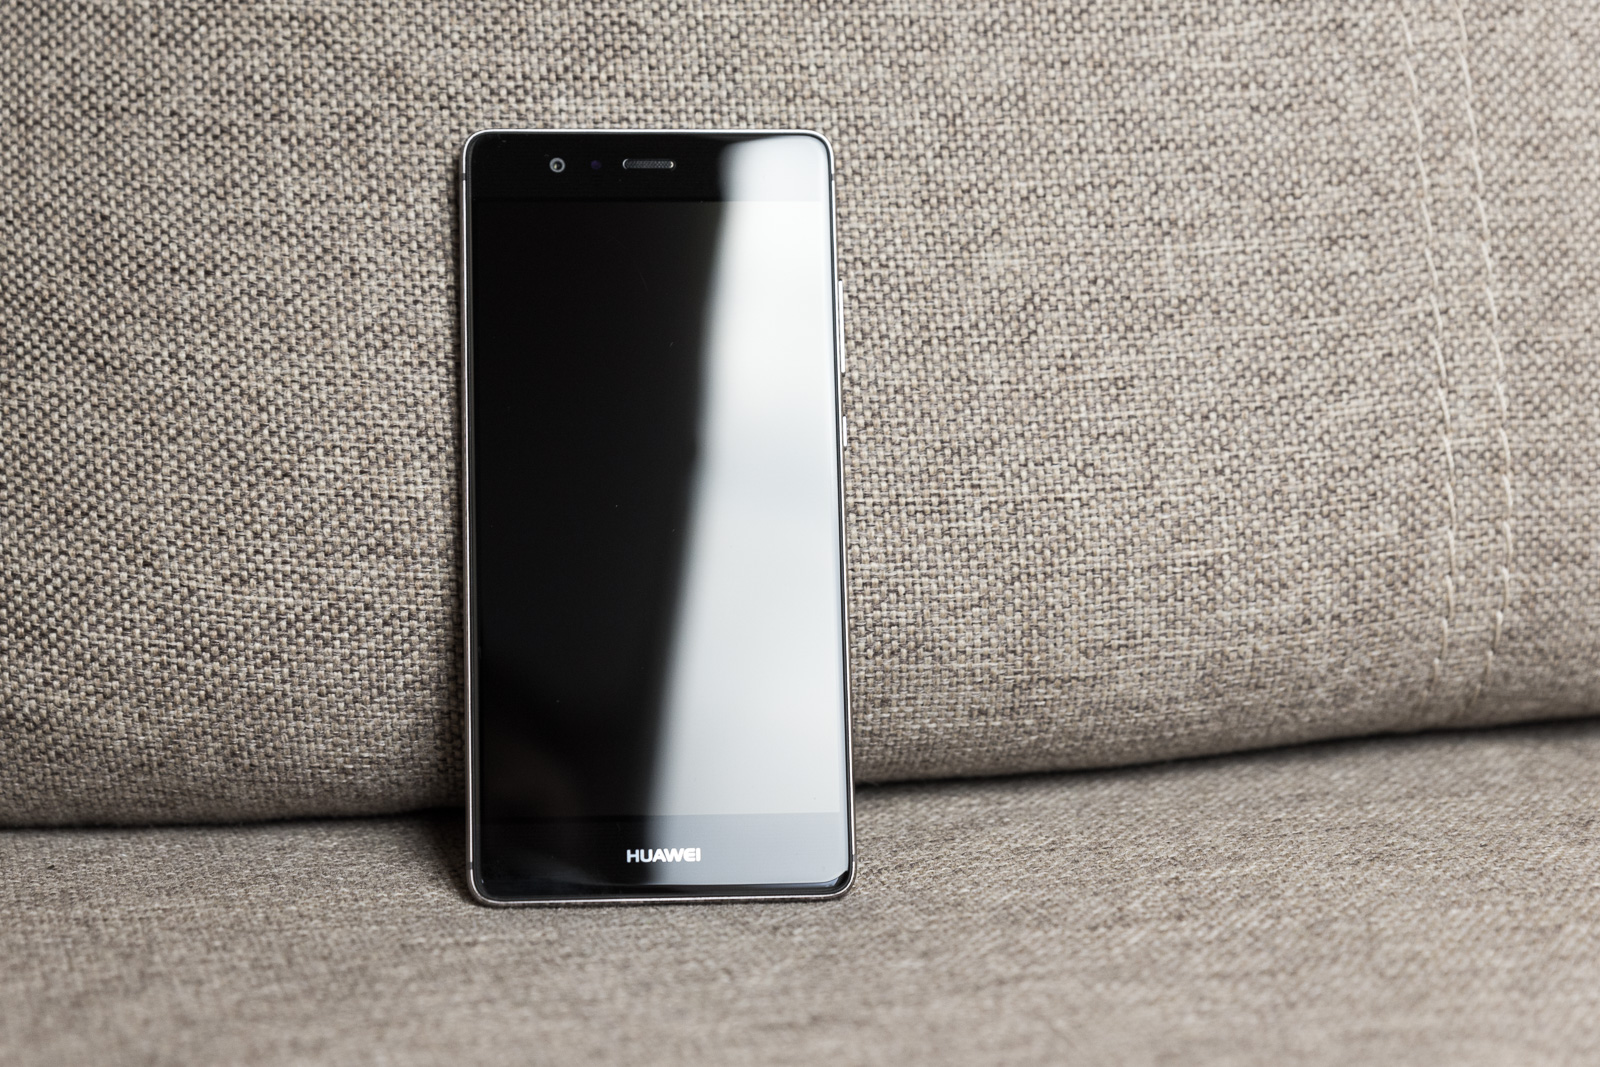 Huawei P9 (7 of 13)